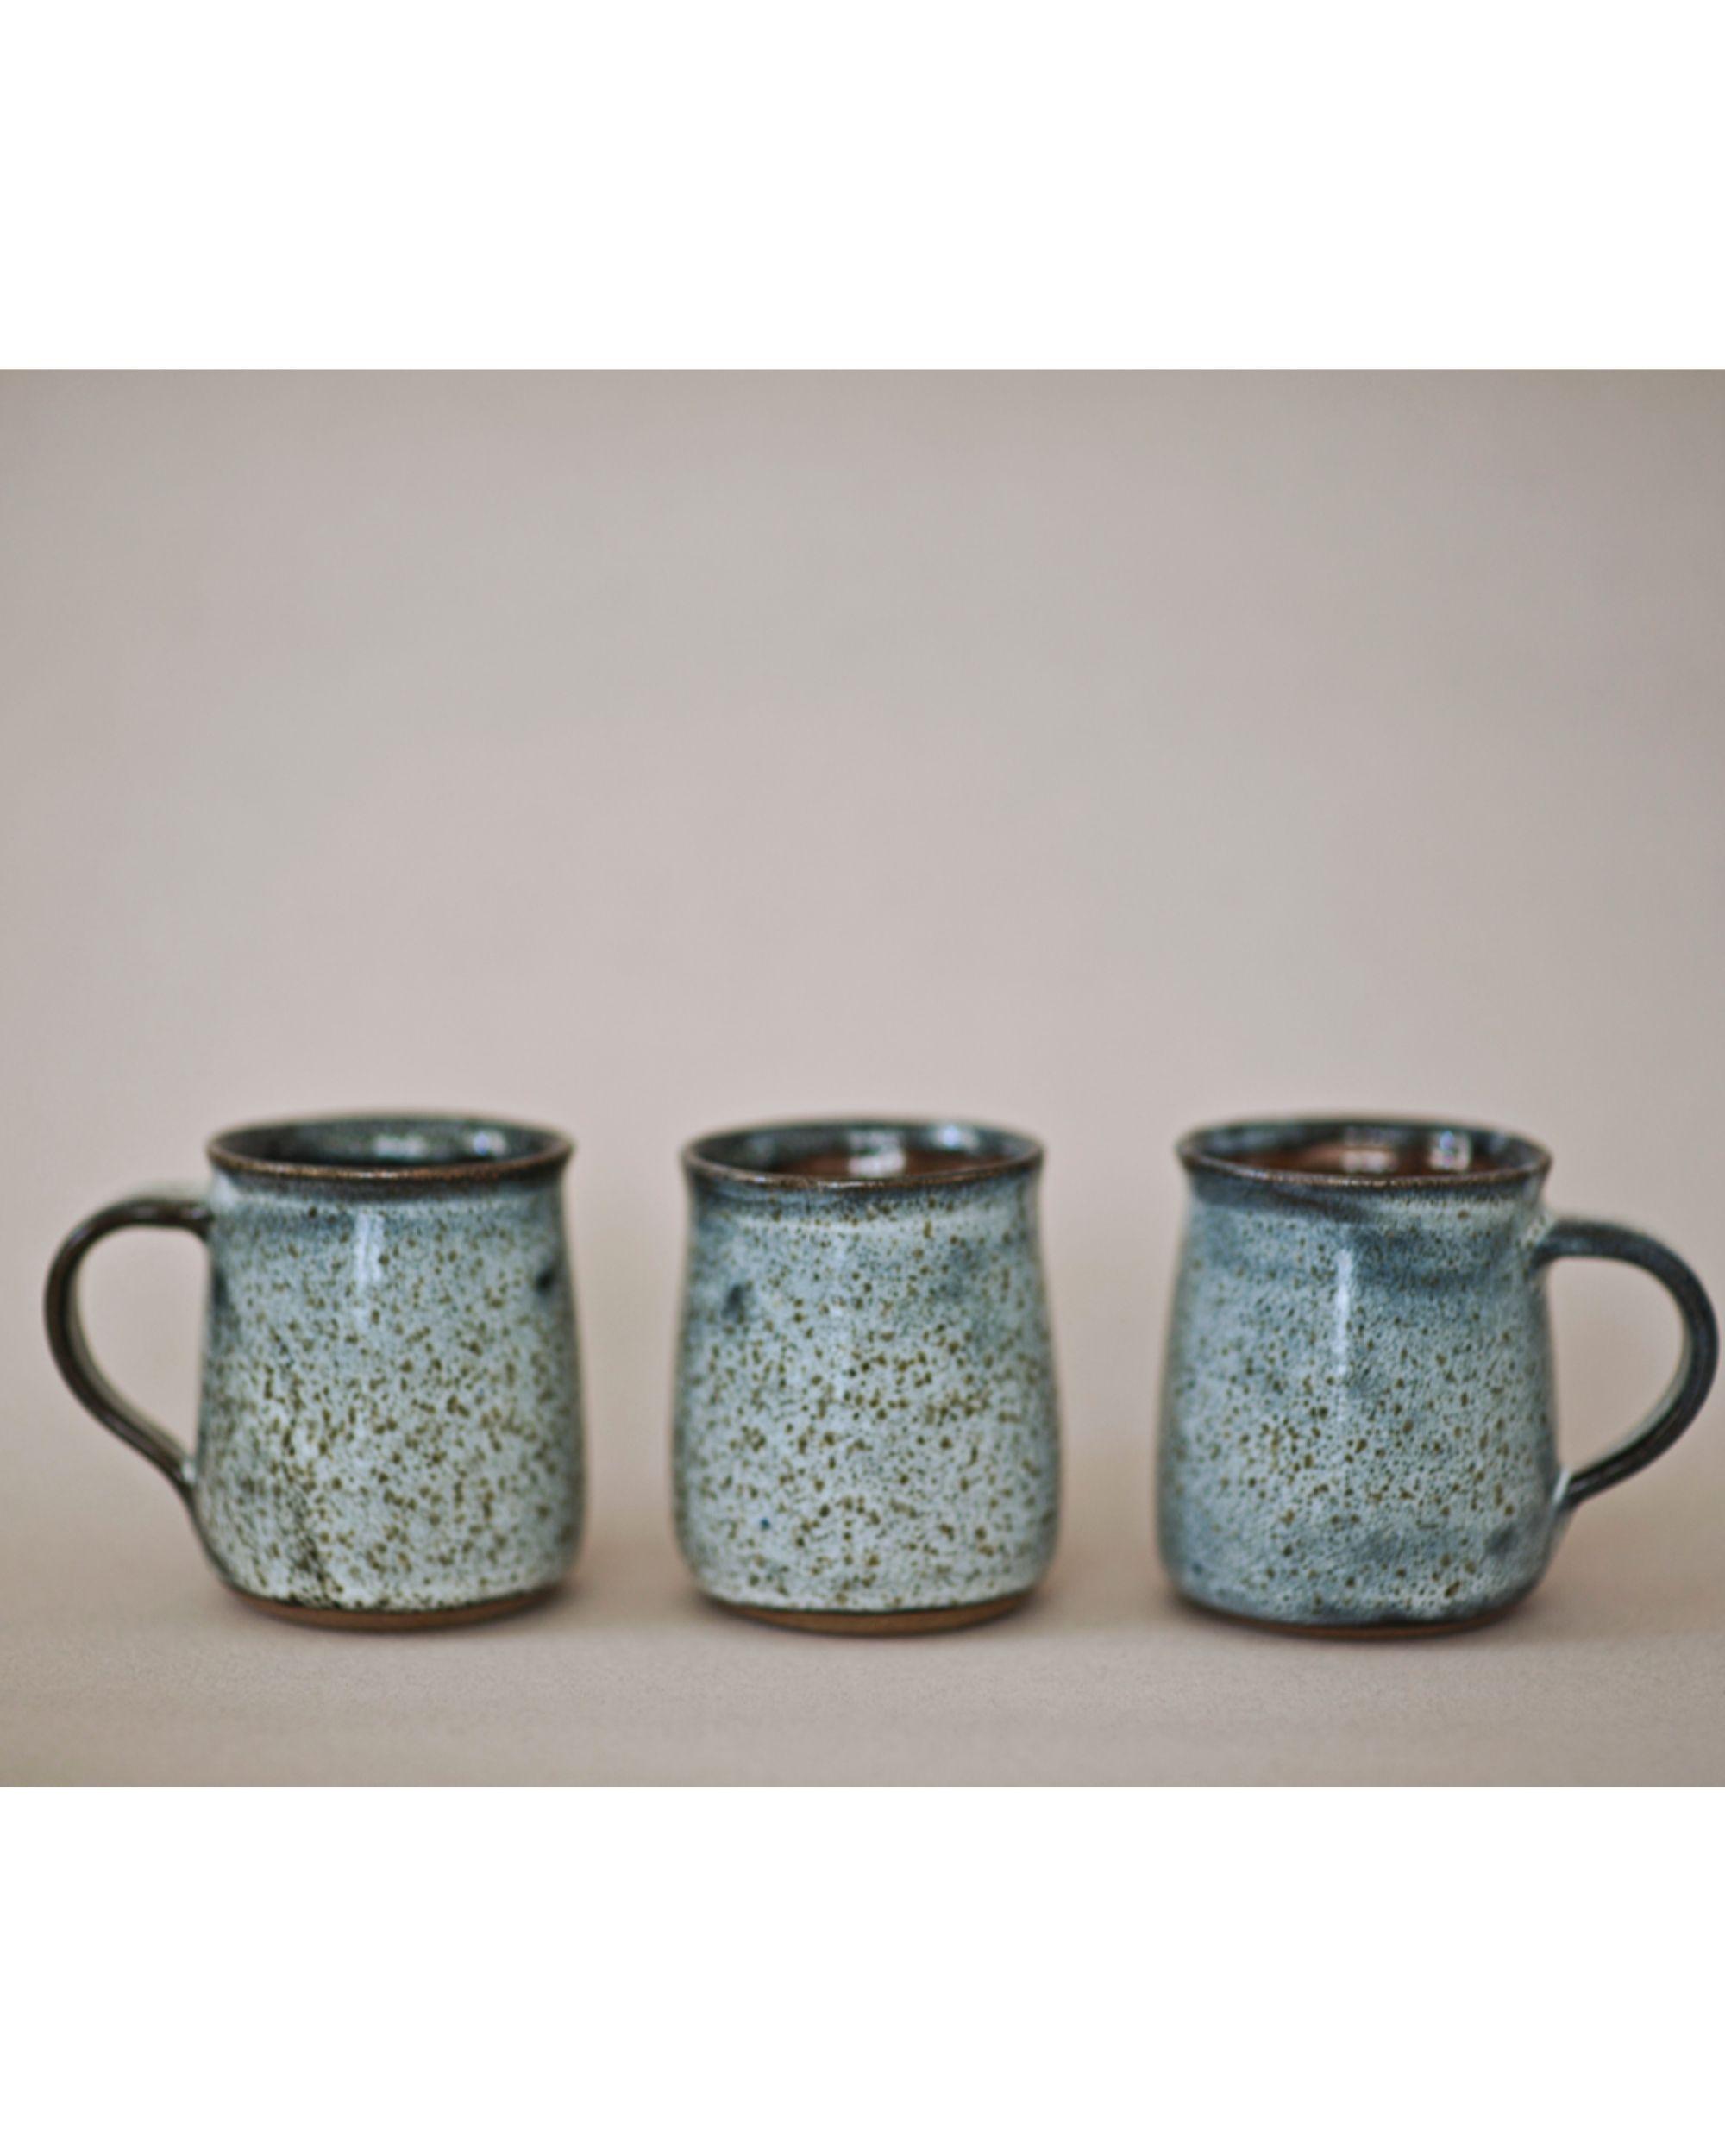 Galaxy coffee mugs - set of two